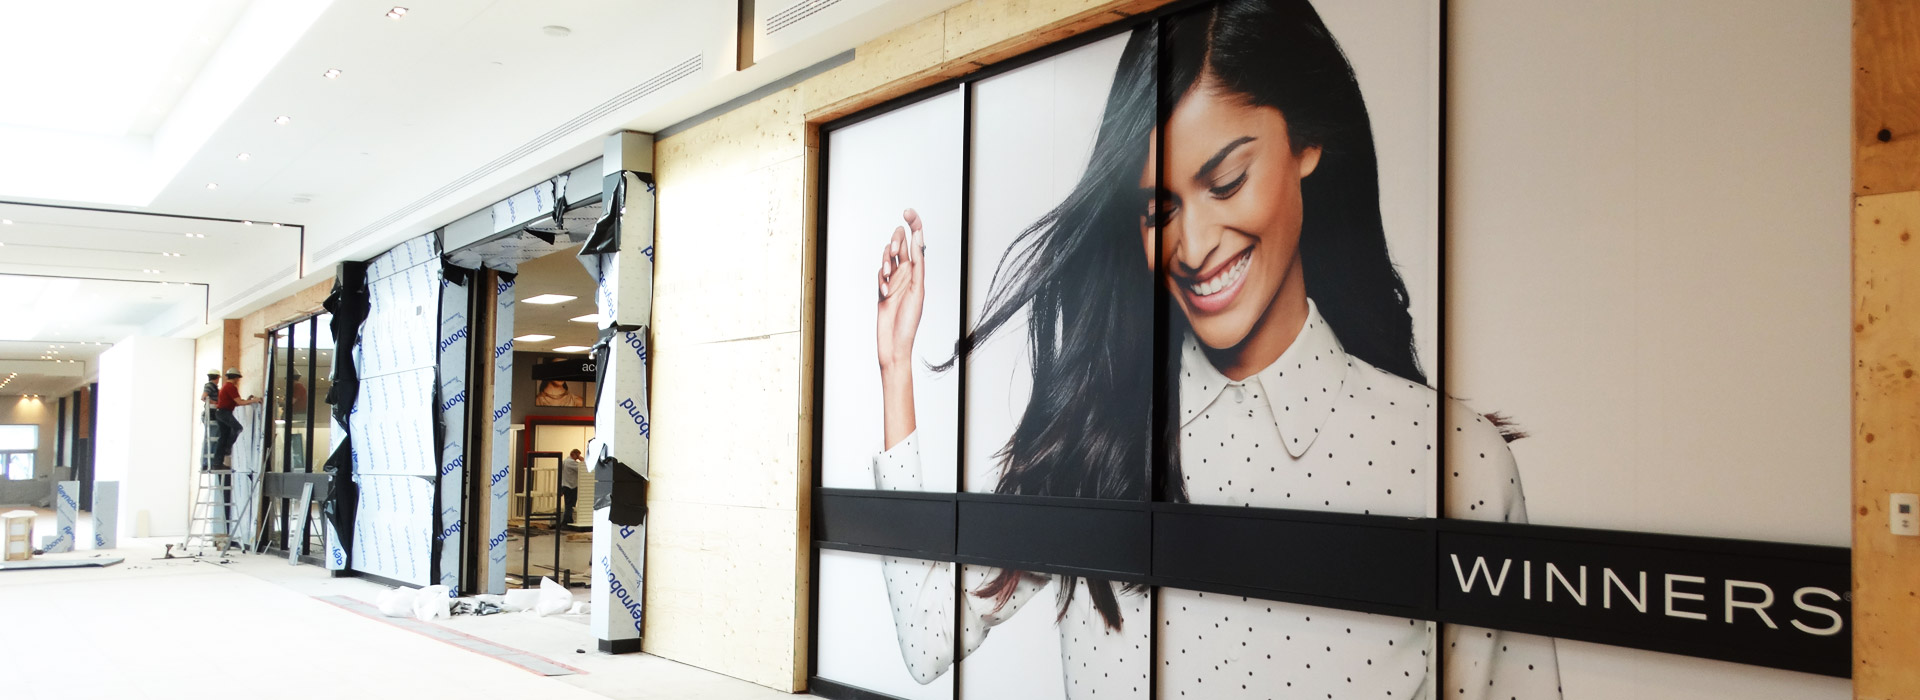 Big Changes Coming to The Burlington Mall